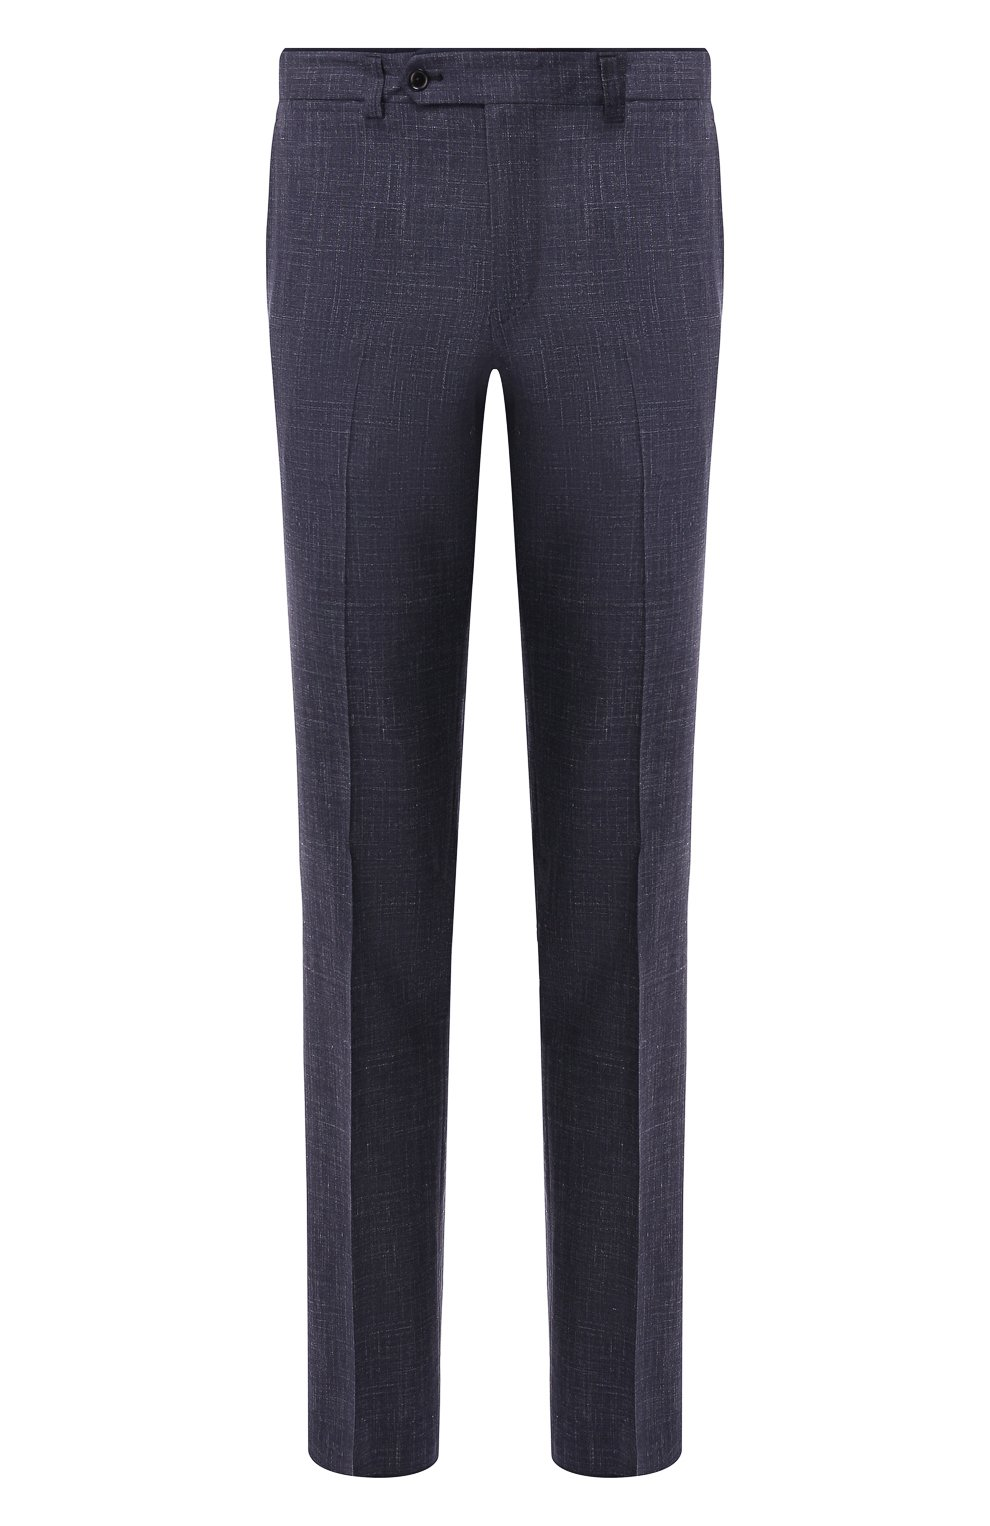 Мужские брюки из смеси шерсти и шелка LUCIANO BARBERA темно-синего цвета, арт. 114014/42705 | Фото 1